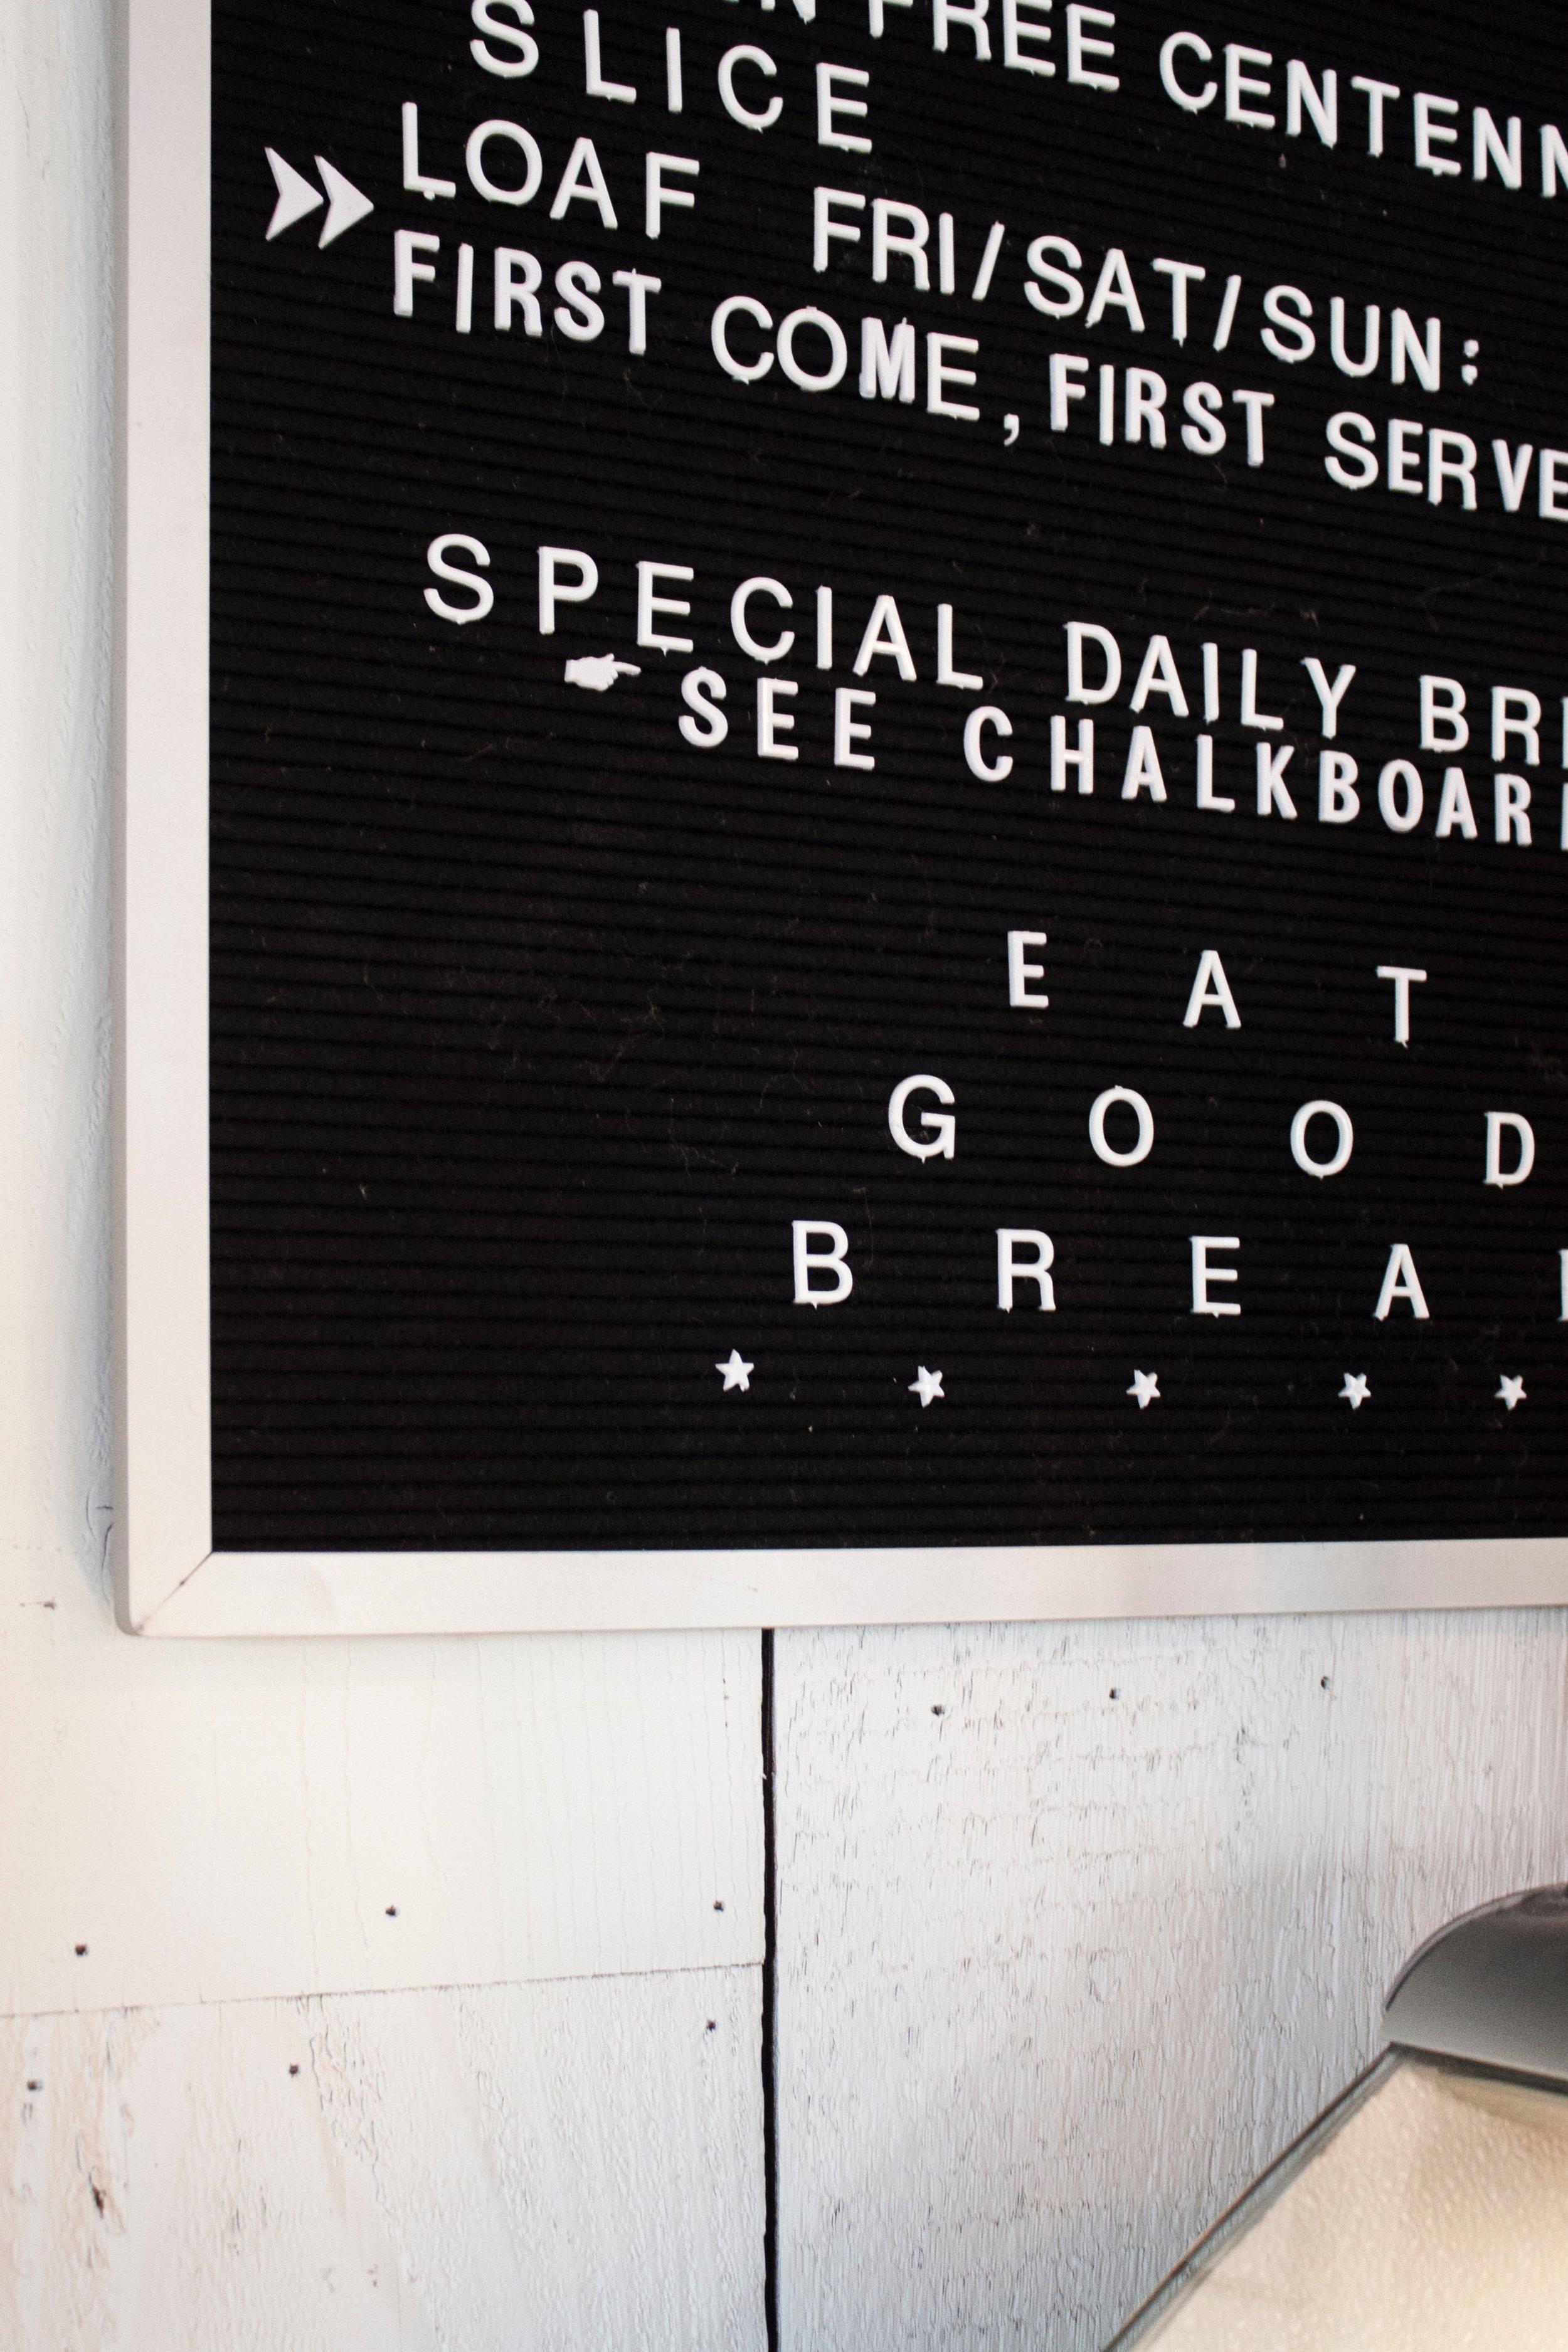 bob's well bread bakery, best california bakeries, los alamos restaurants, los alamos ca, where to eat in los alamos, los alamos travel guide, los alamos dining